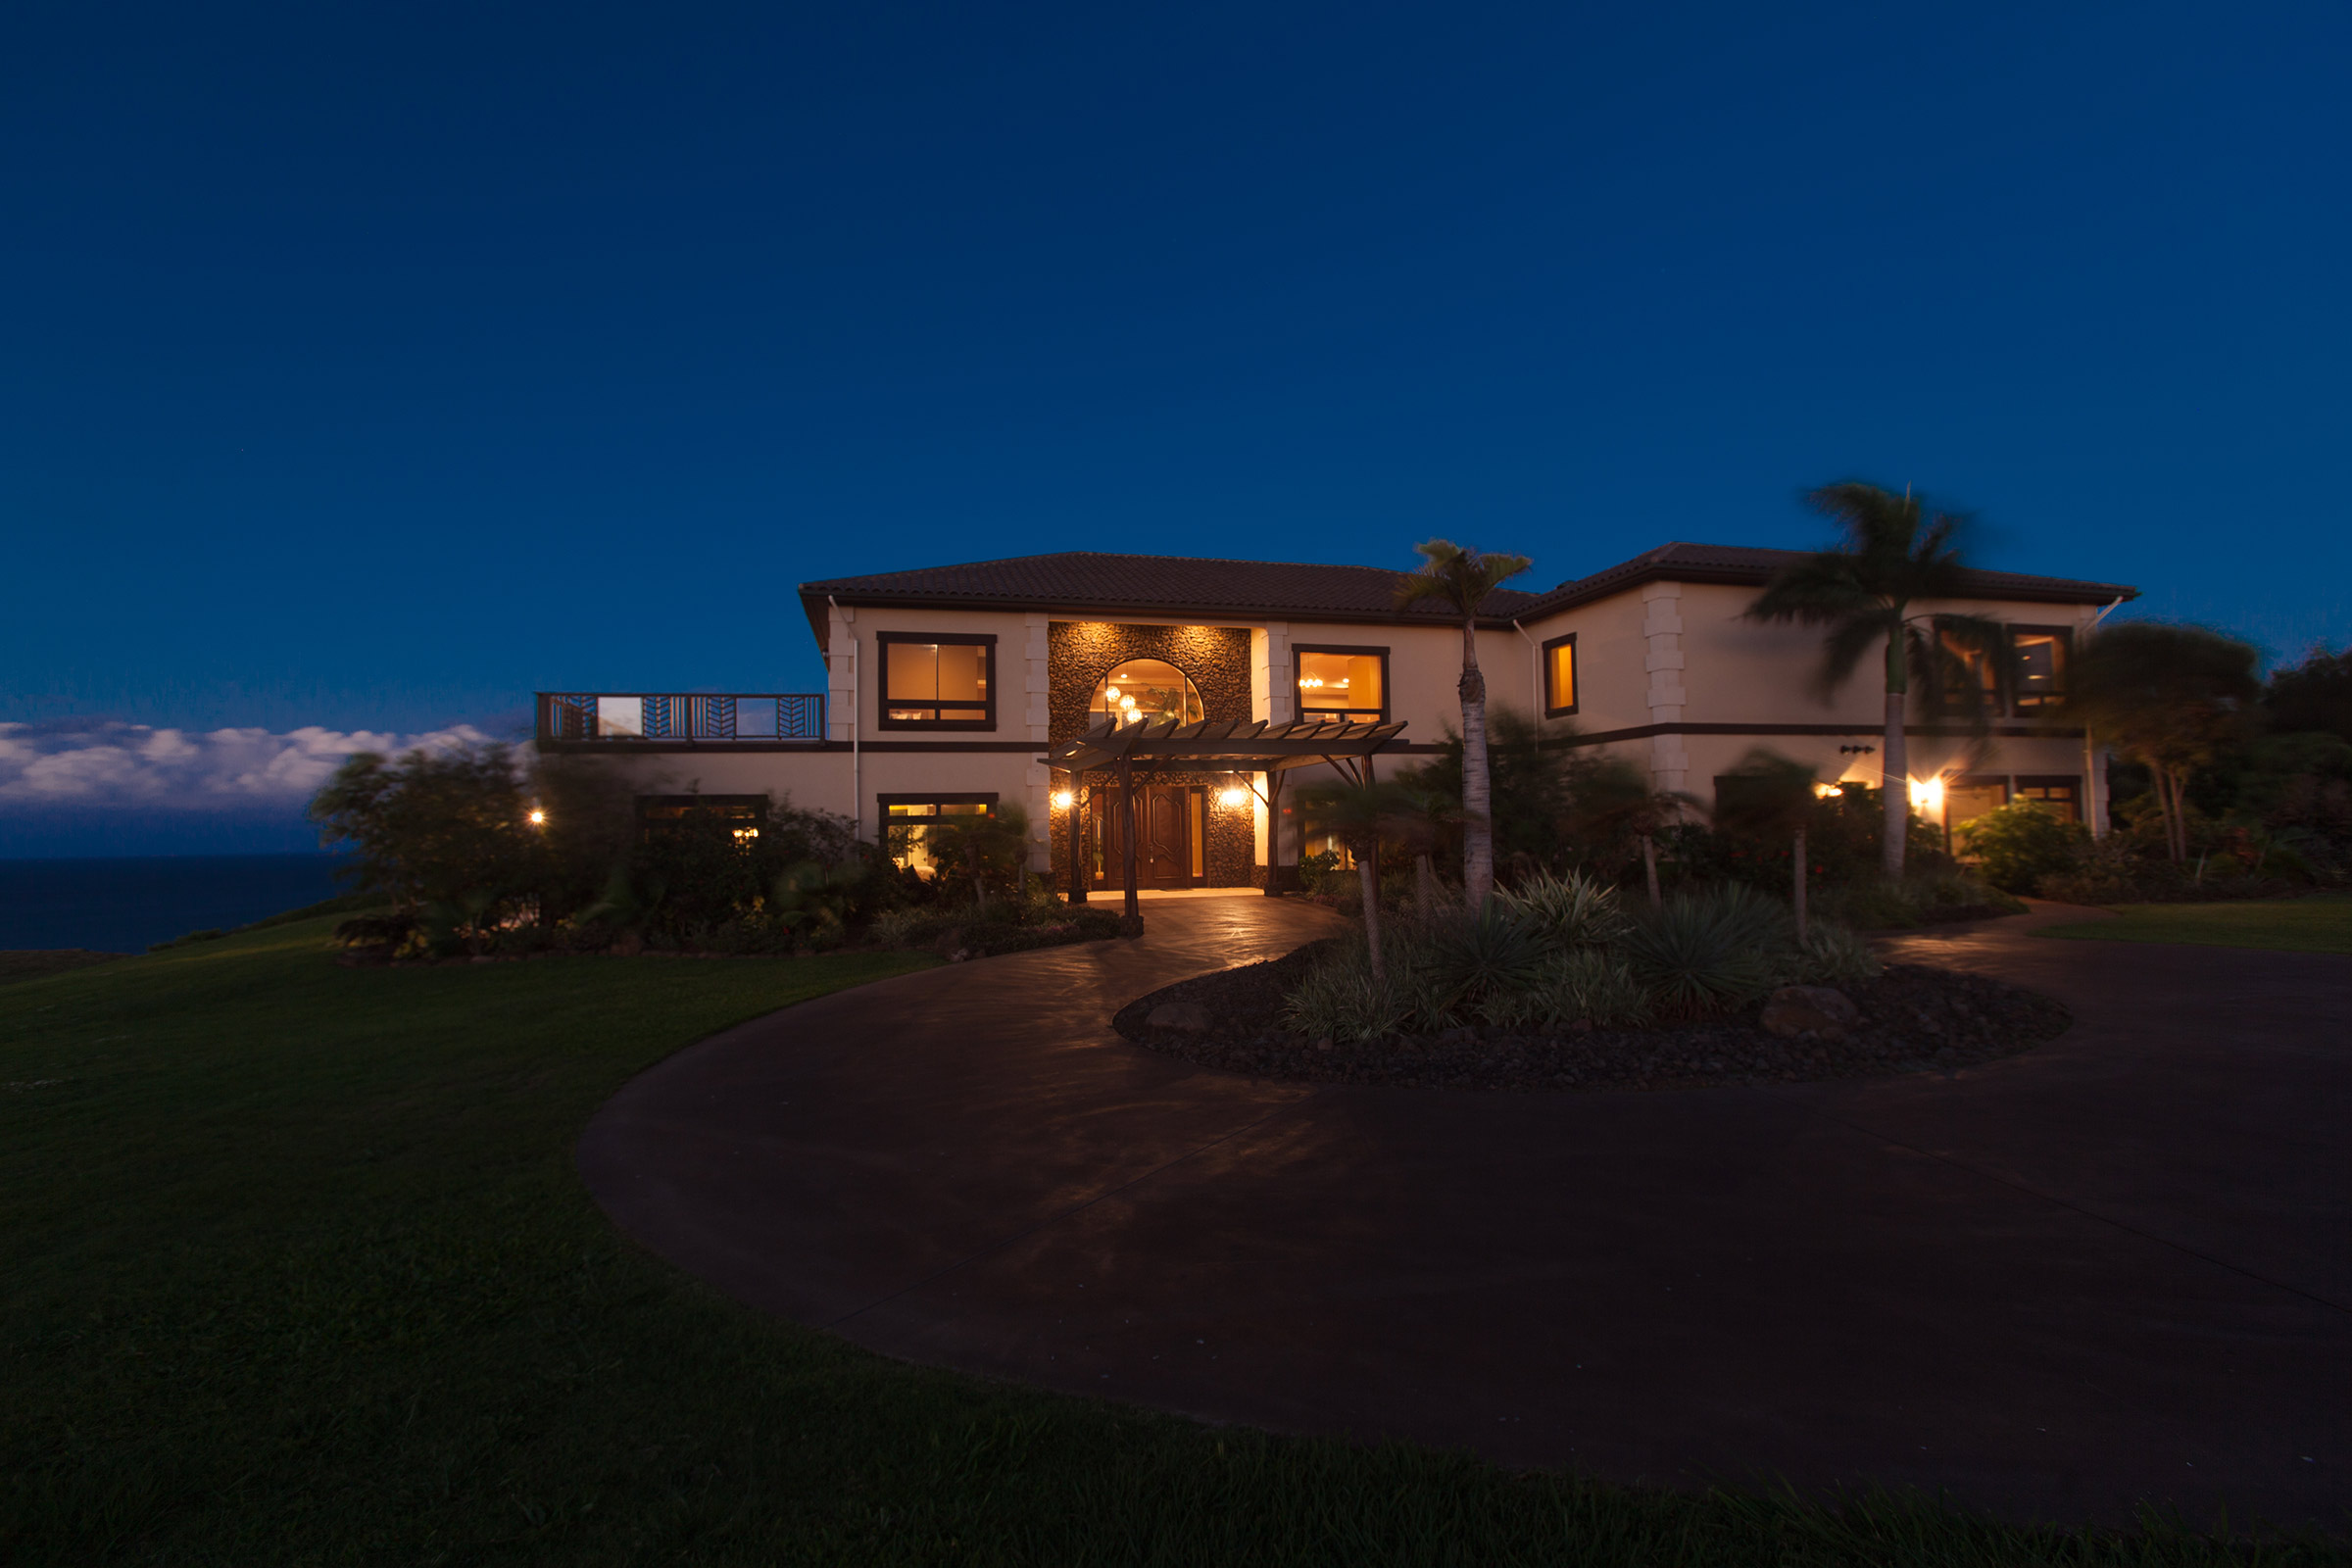 real-estate-photographer-018.jpg